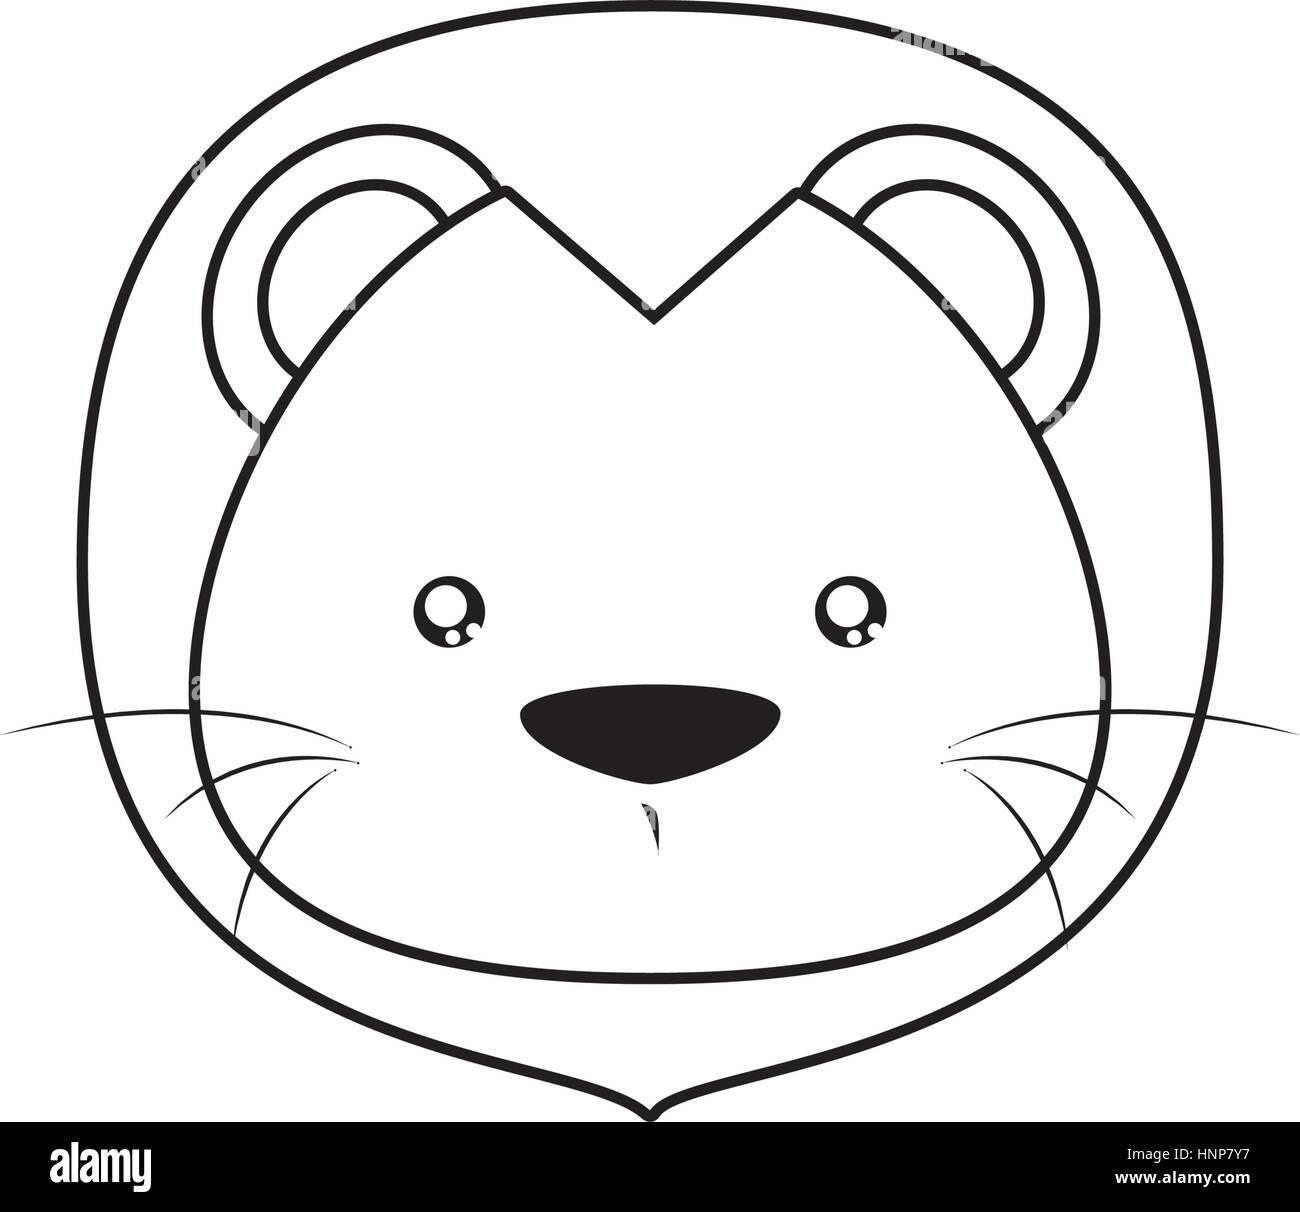 Uncategorized Lion Drawing Face lion drawing face stock vector art illustration image face